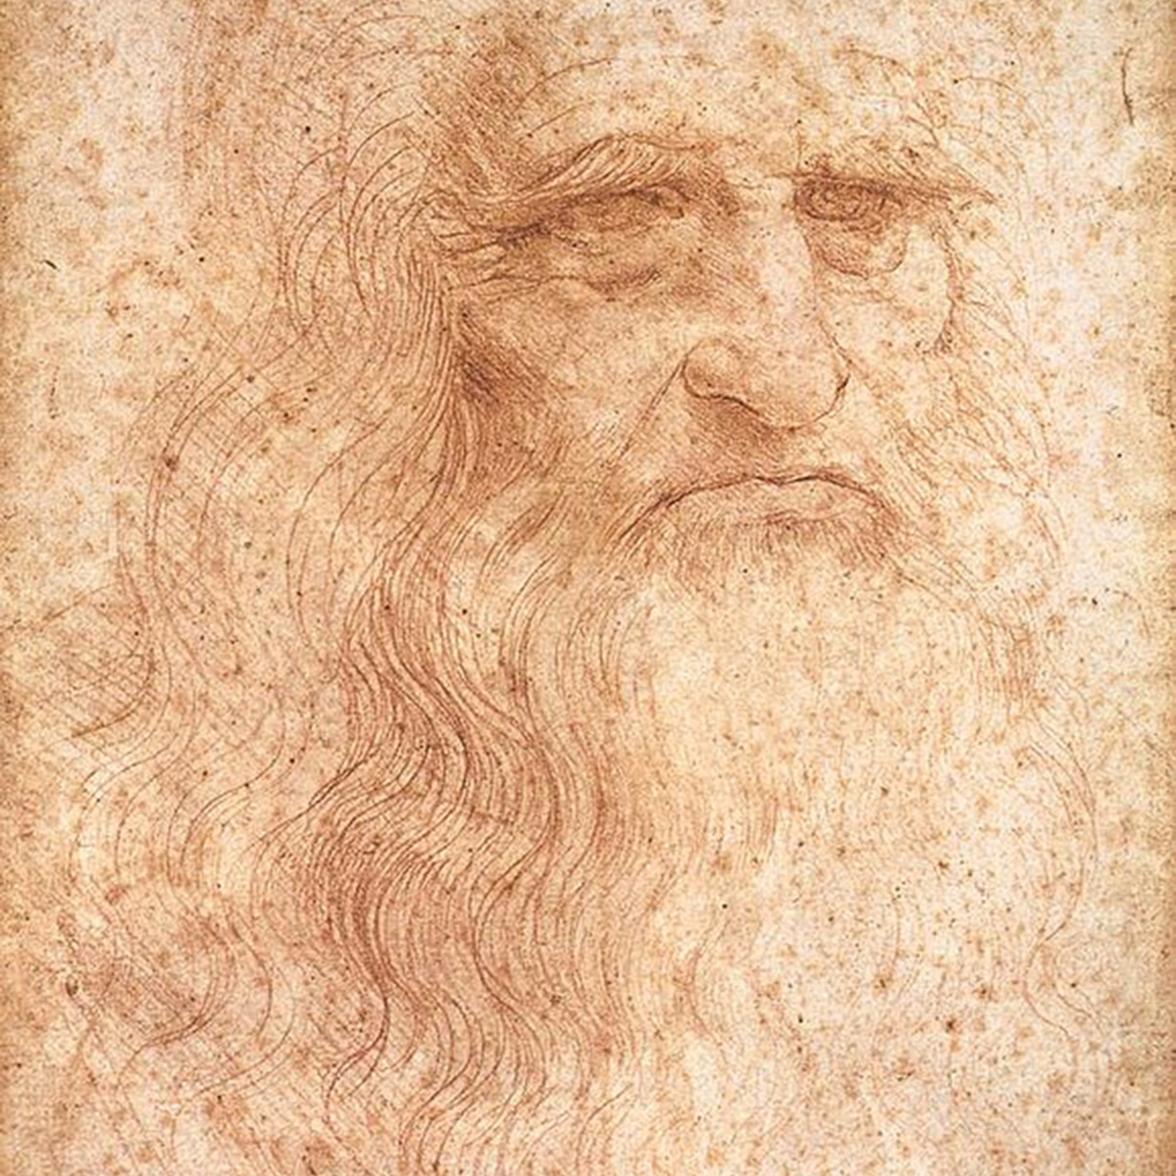 Autoportrait attribue a Leonardo da Vinci, photo © DR